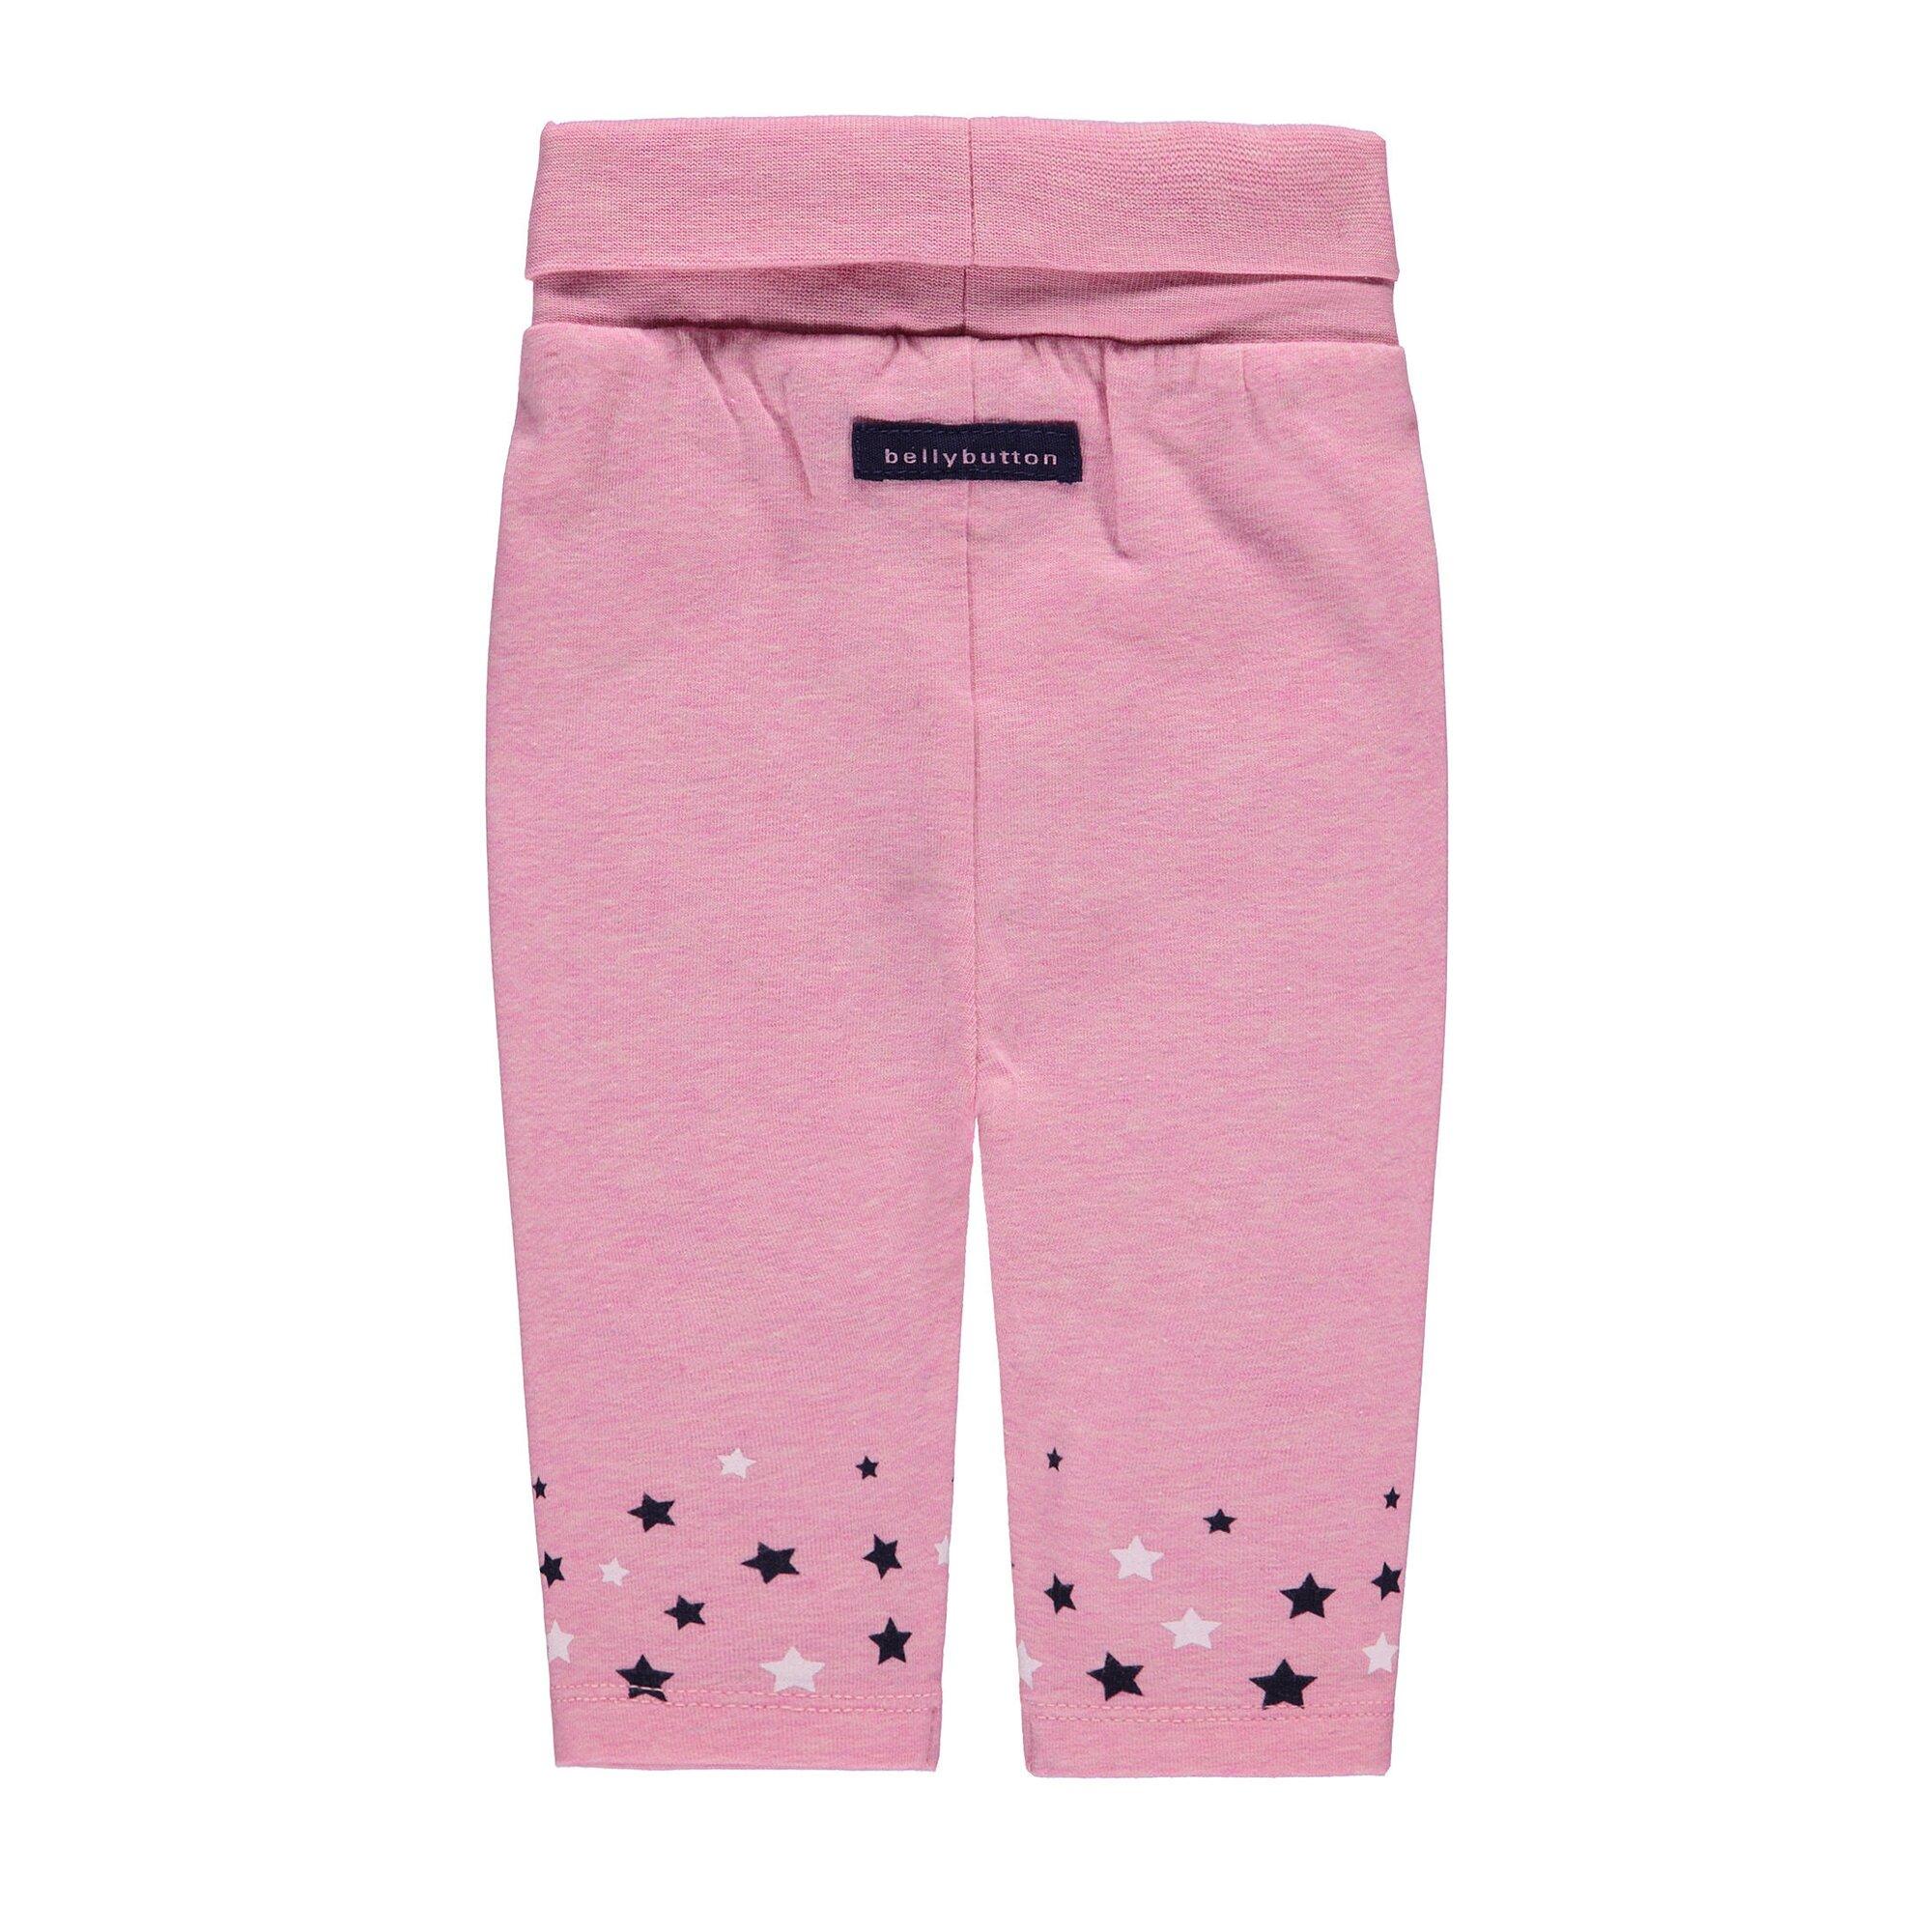 bellybutton-leggings